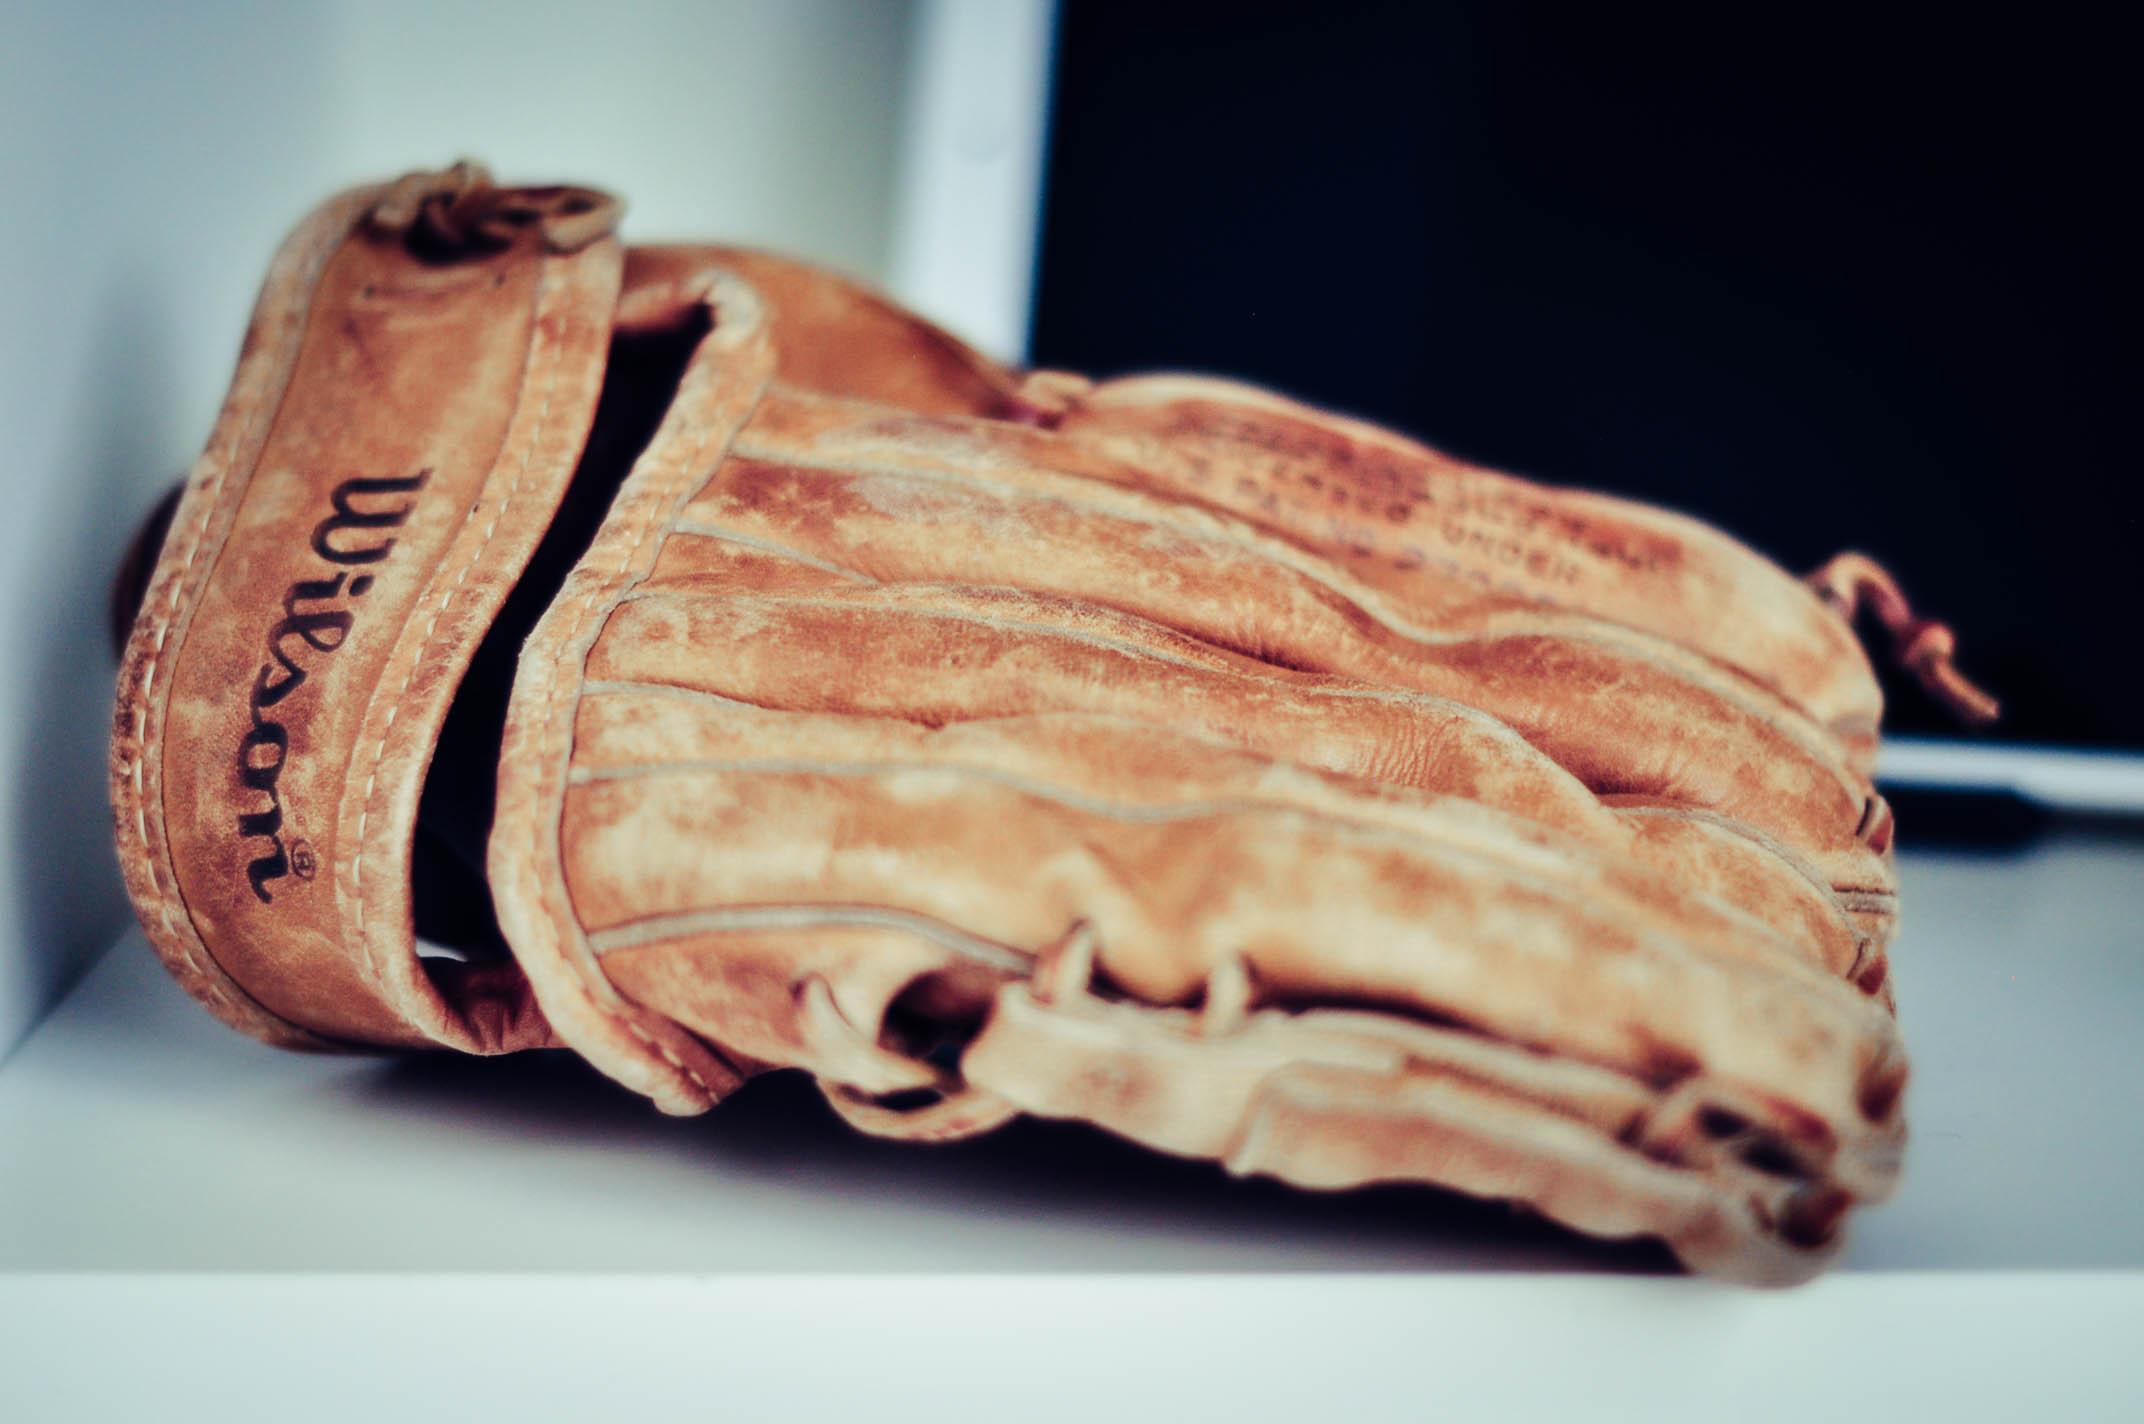 Worn leather softball glove